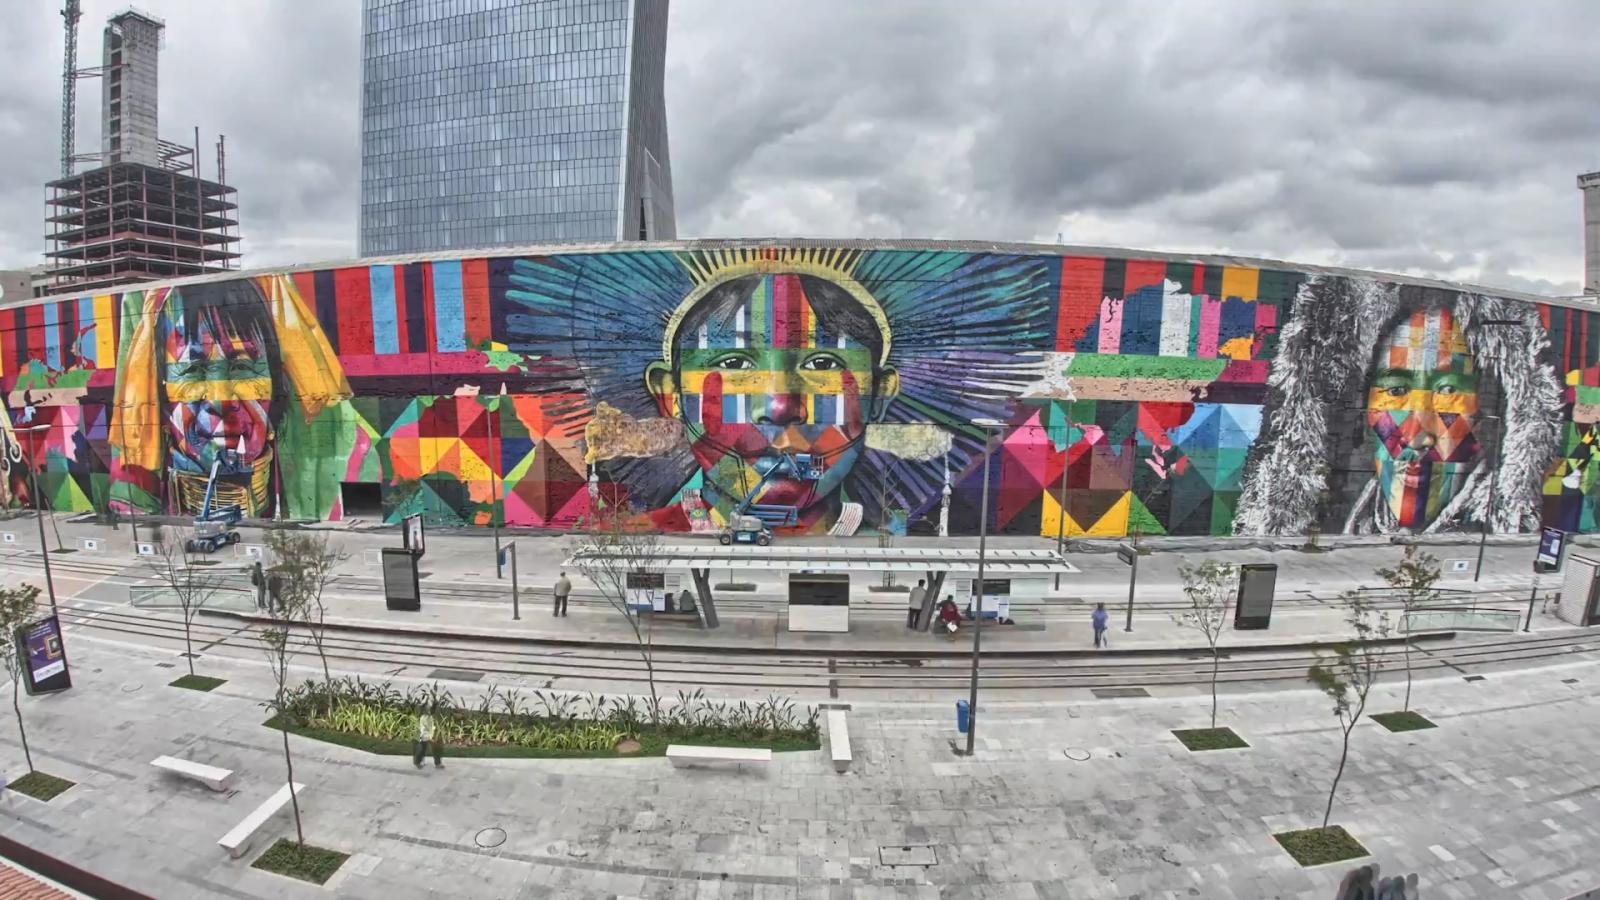 Graffiti artists creates masterpiece for Rio Olympics